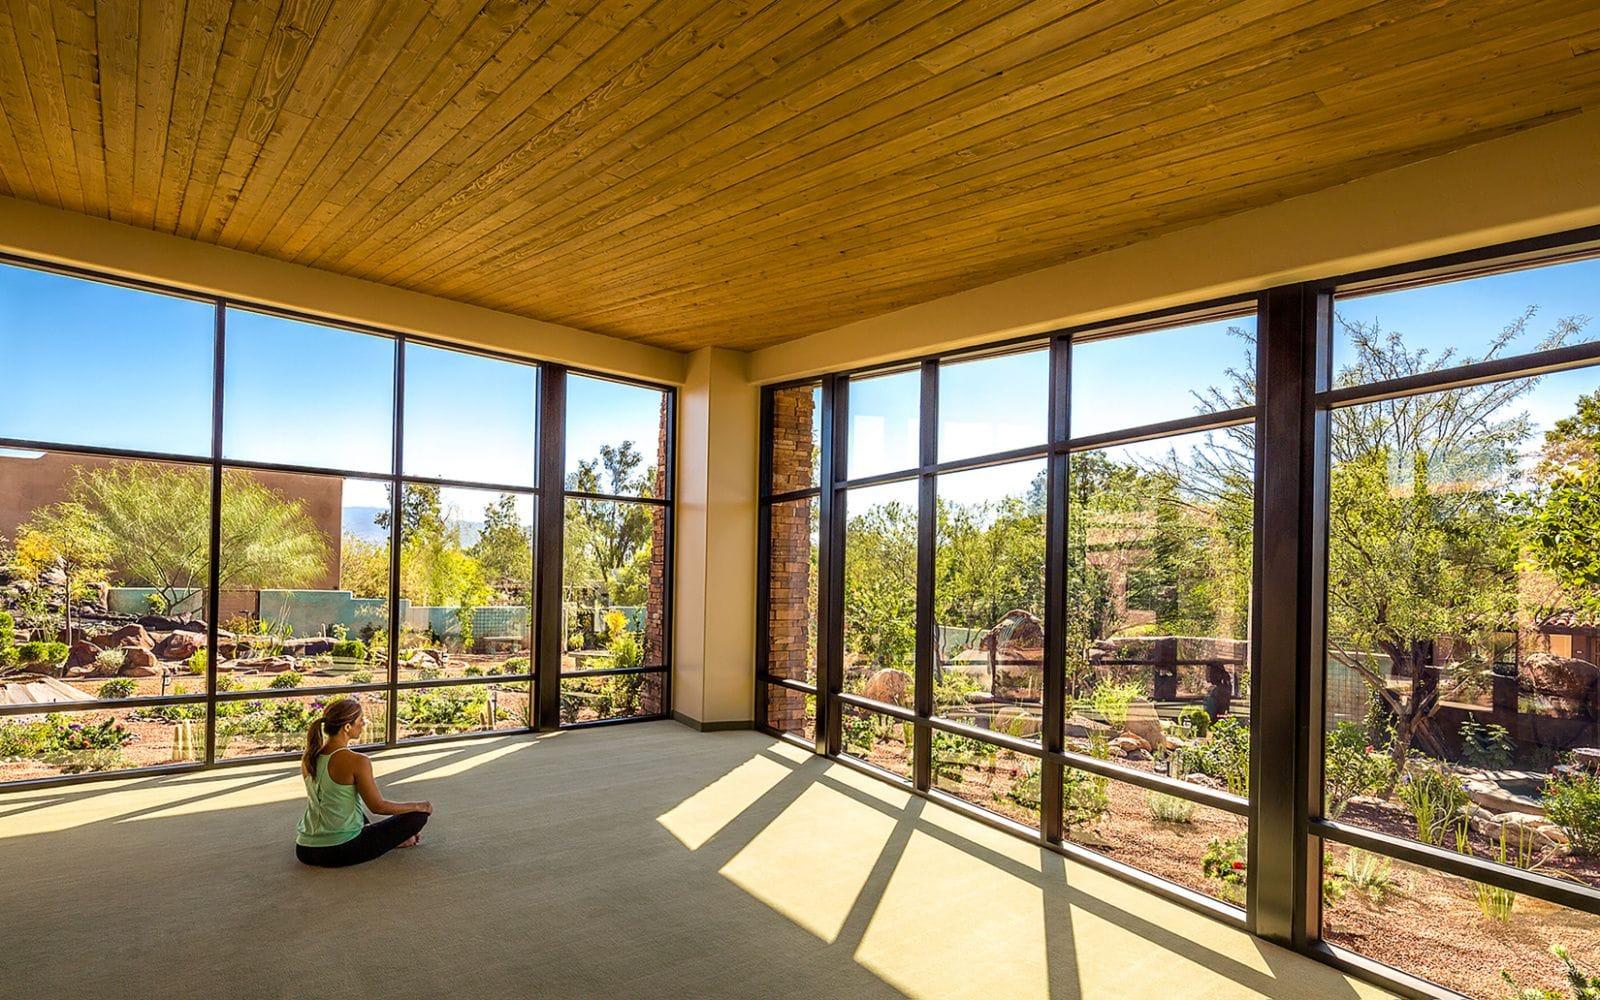 best luxury wellness retreats in the USA, american wellness retreats